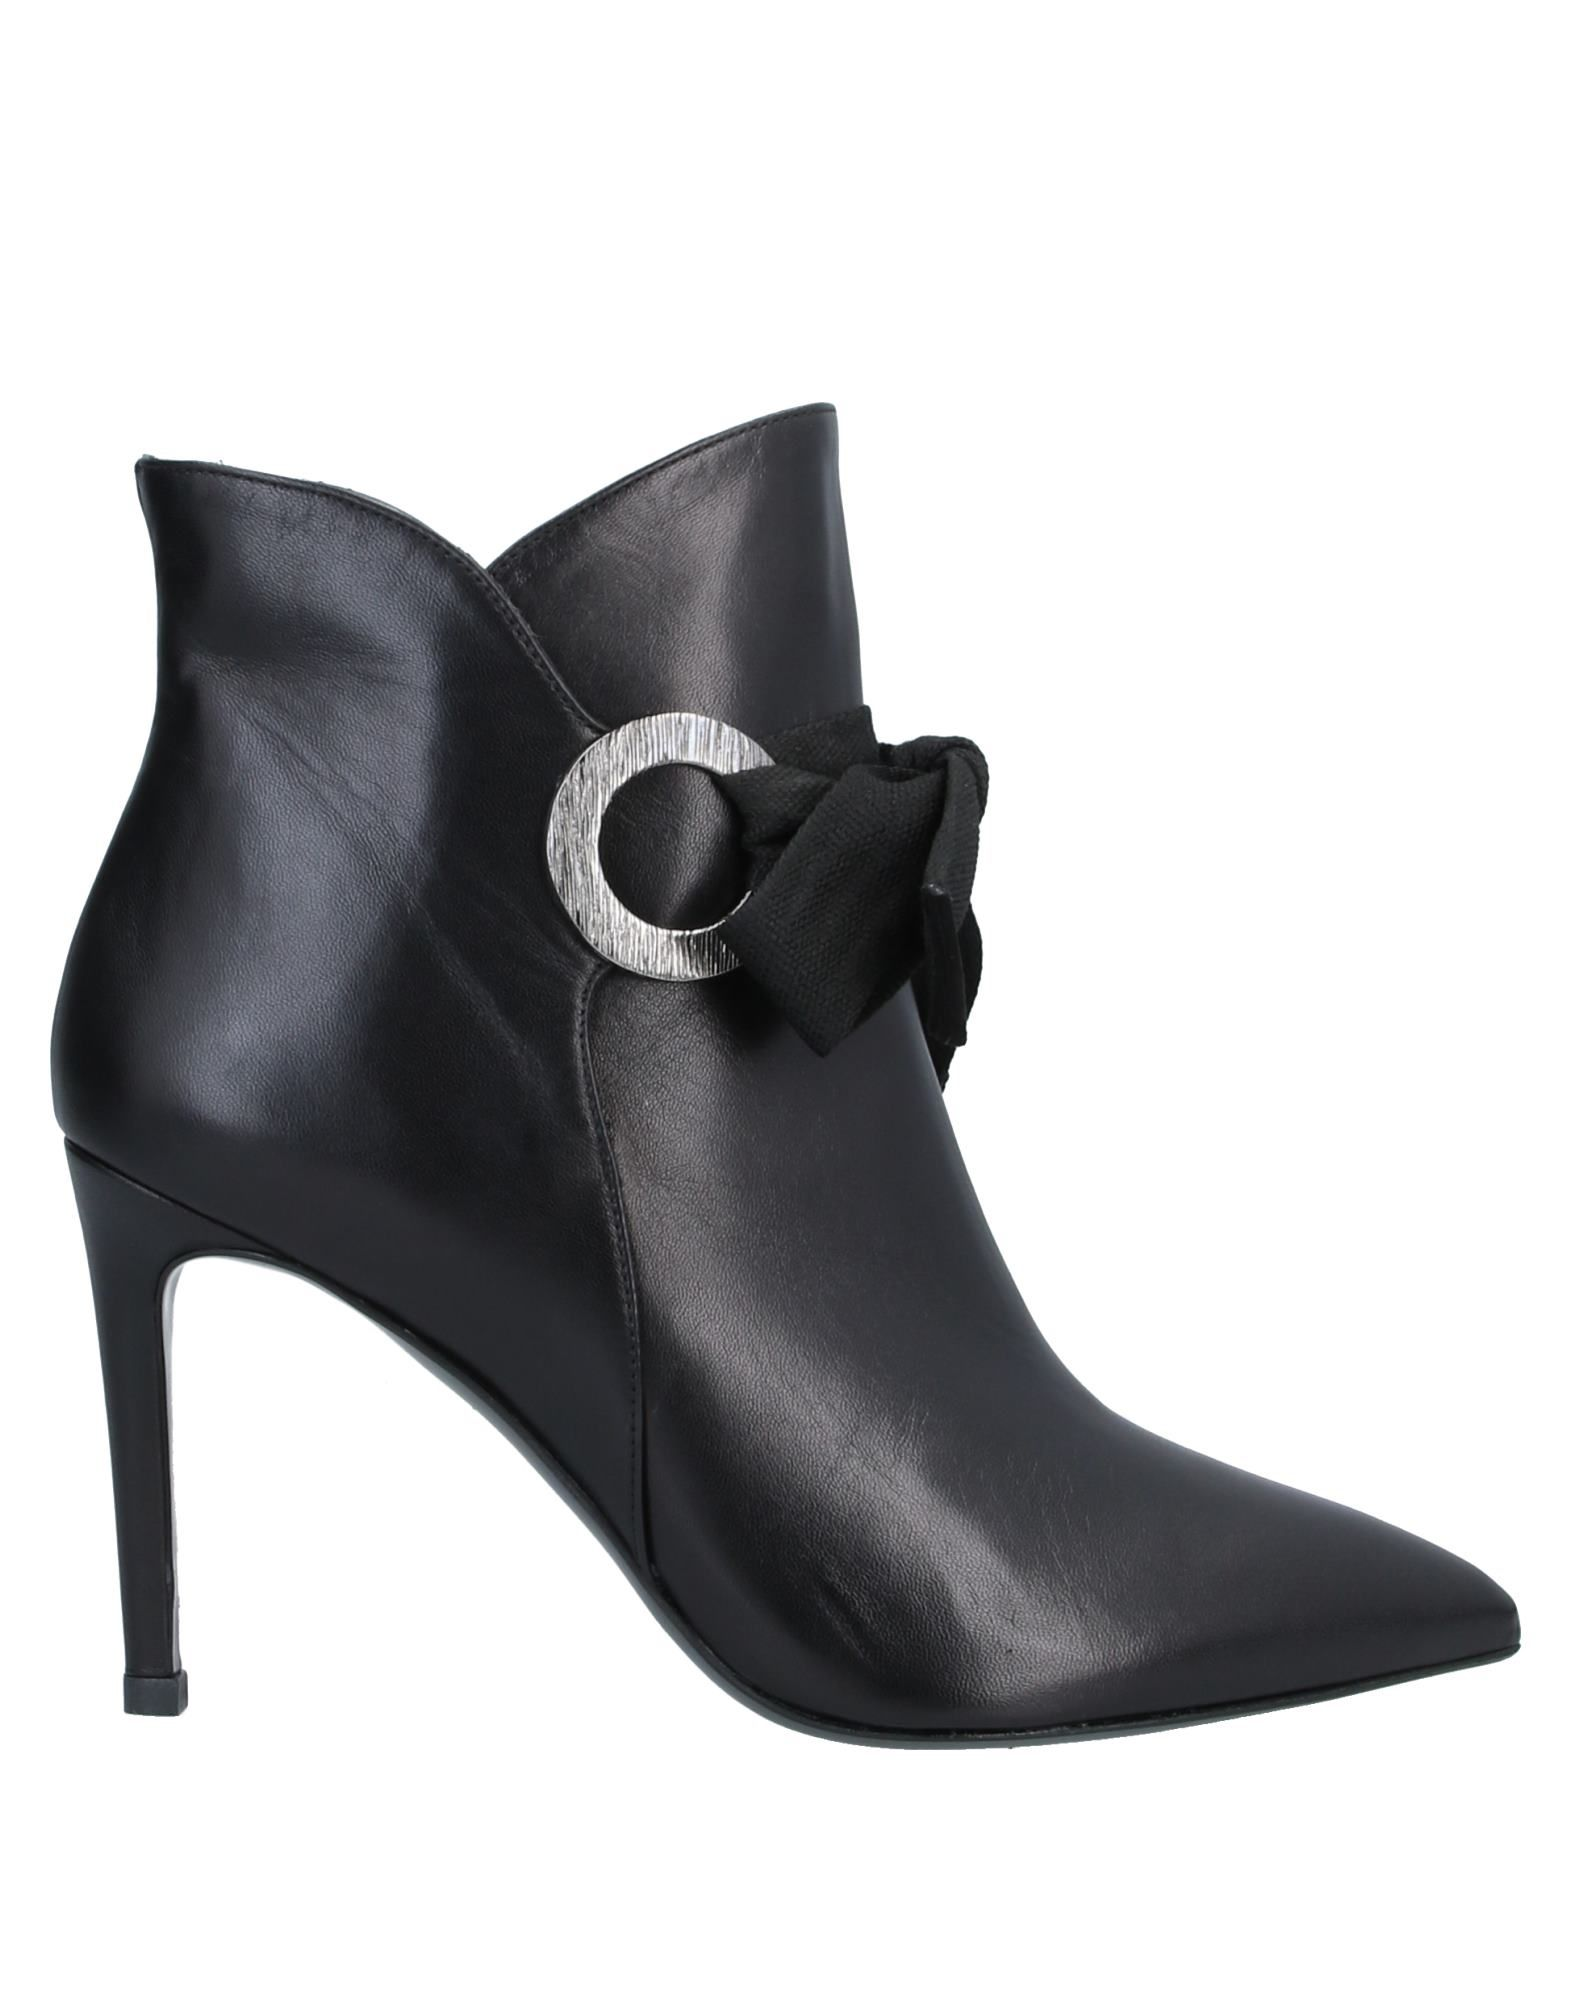 Фото - GIANNI MARRA Полусапоги и высокие ботинки gianni bravo полусапоги и высокие ботинки